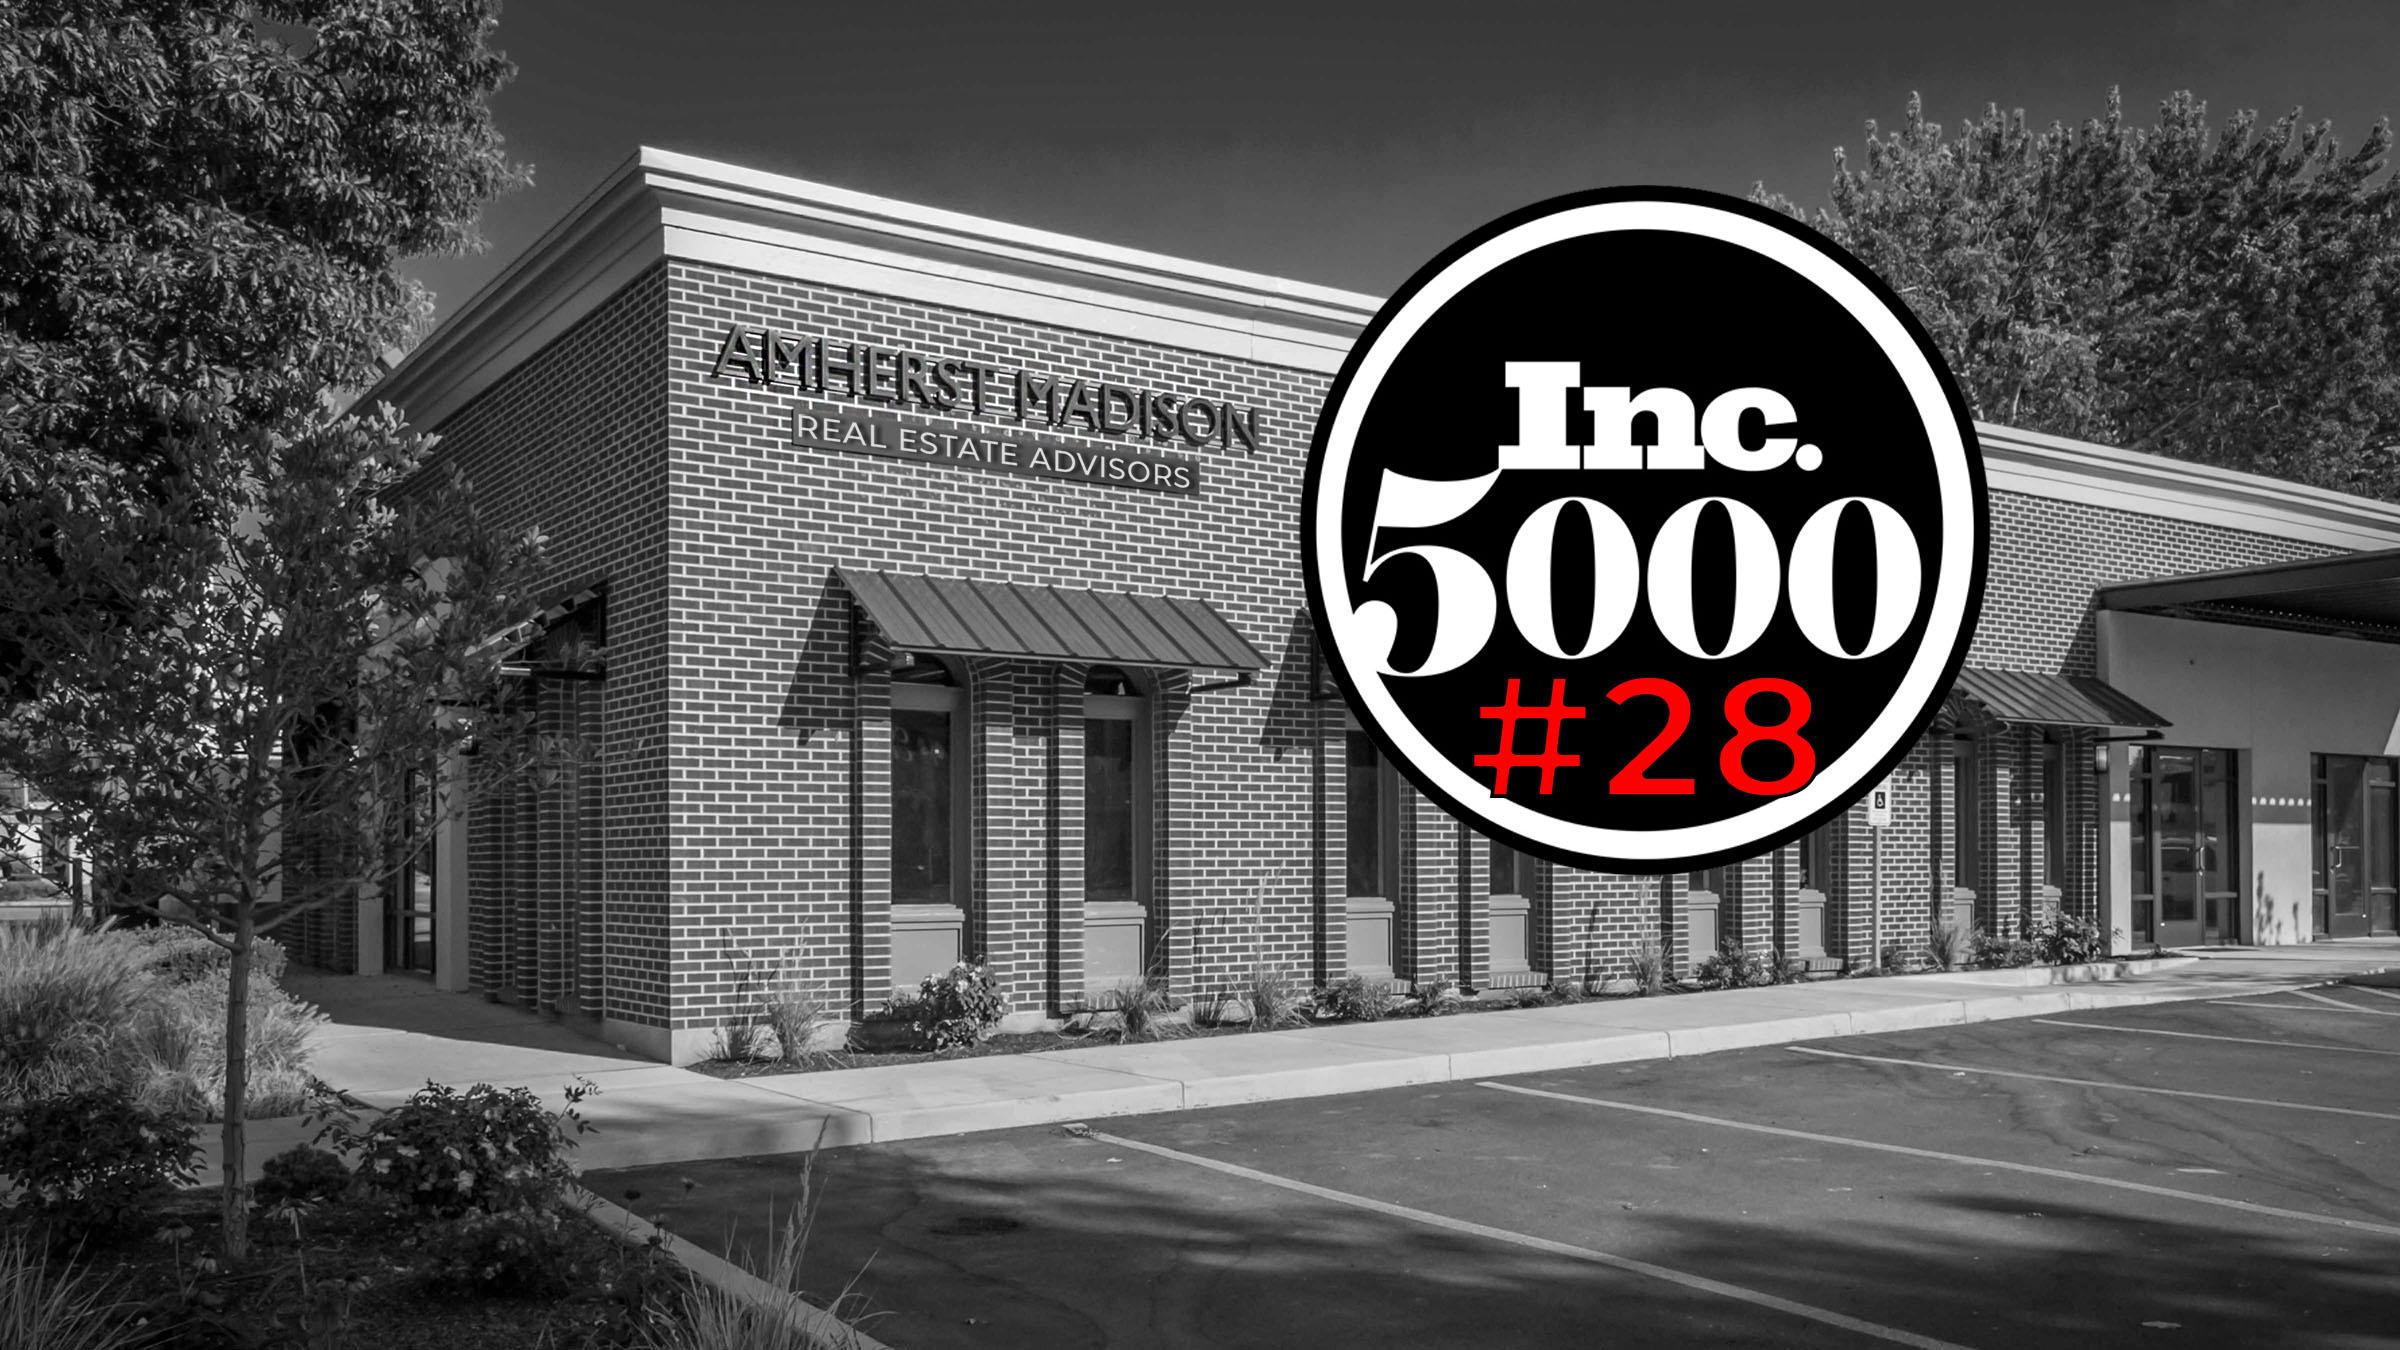 Amherst Madison Ranks No. 28 on the 2019 Inc. 5000